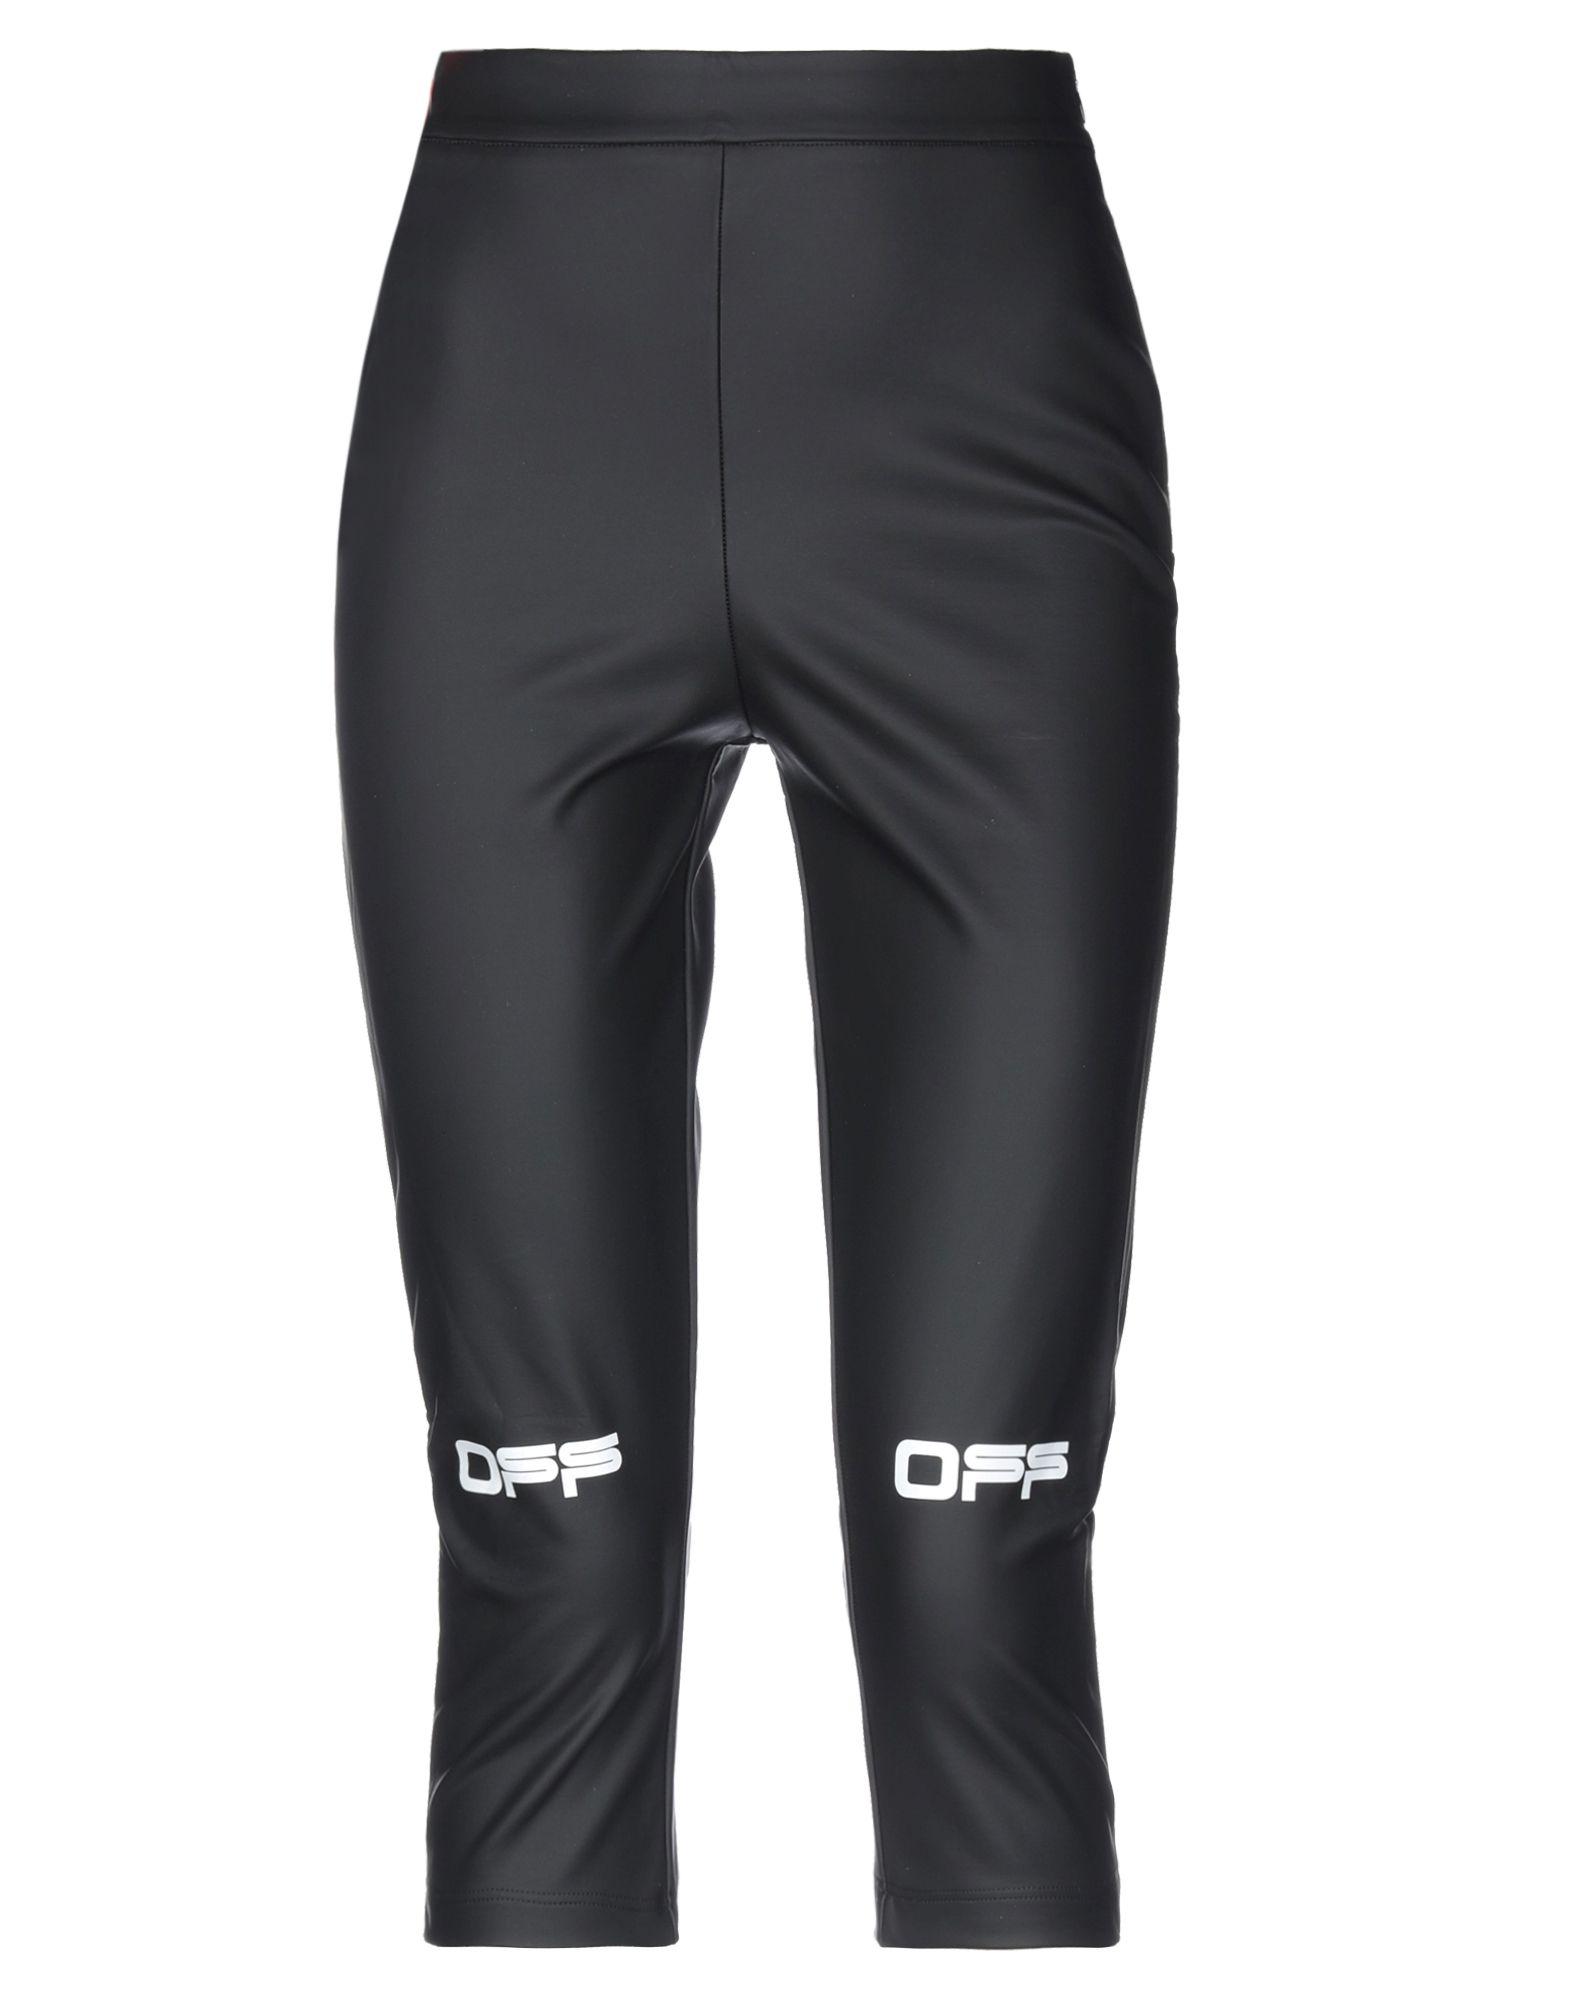 OFF-WHITE™ Leggings. faux leather, solid color, logo, print, mid rise, slim fit, straight leg, zipper closure, no pockets, stretch. 70% Viscose, 15% Polyurethane, 10% Polyamide, 5% Elastane